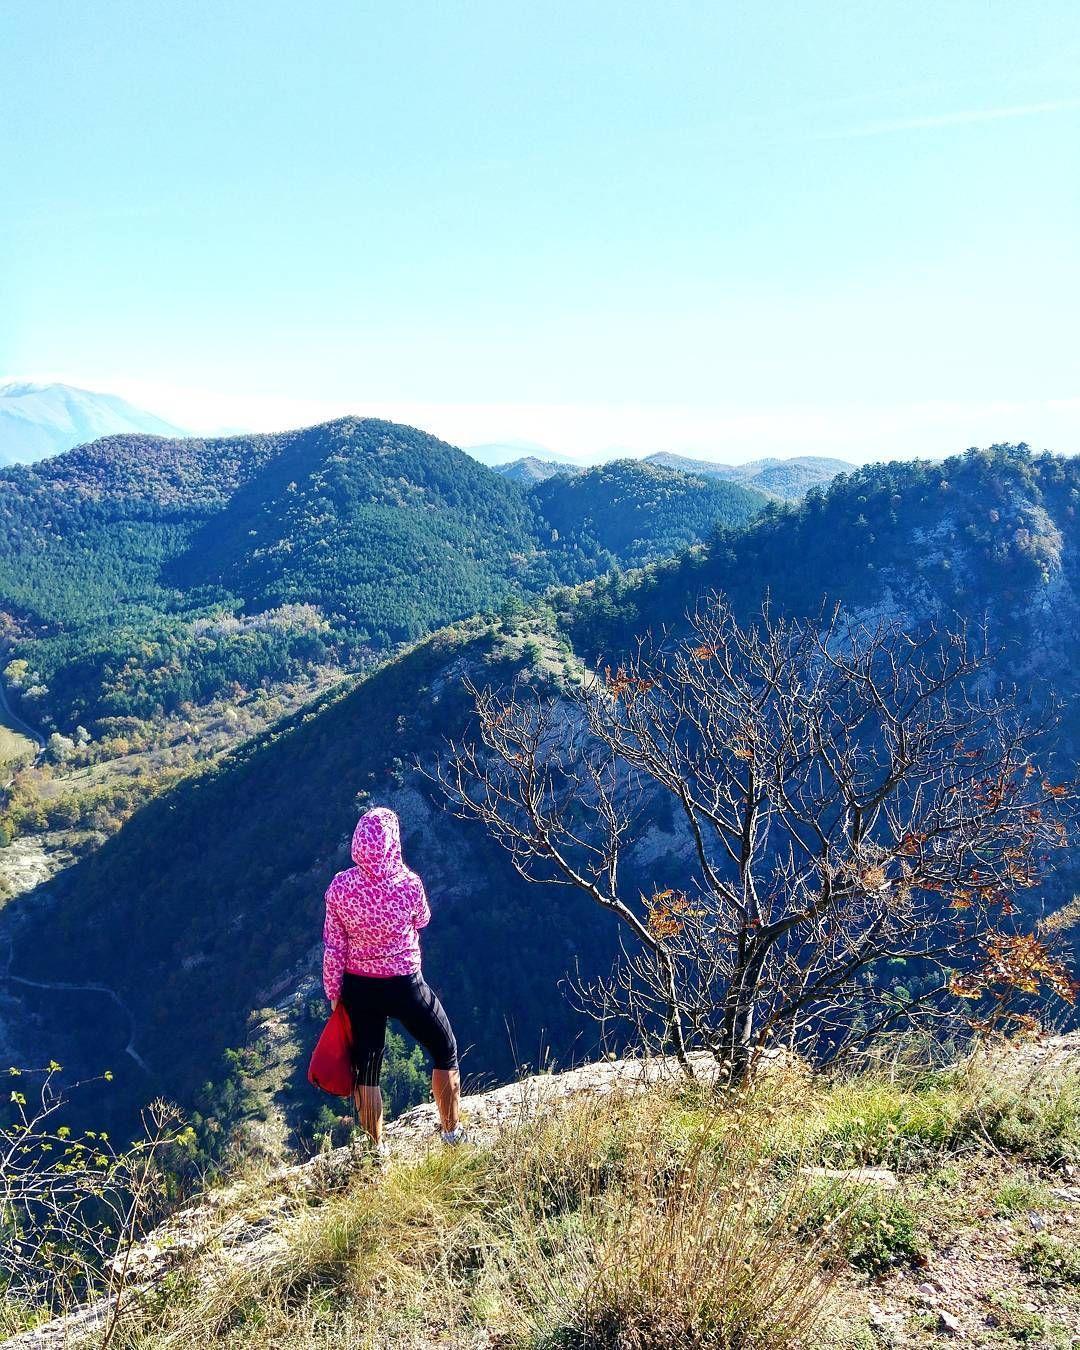 Listening the wind . . . #friend #amica #igworldclub #italia #italy #igersitalia #sky #vscoitaly #ig_Italia #ig_Italy #mountains #trekking #instagramitalia #panorama #landscape #whatitalyis #vsco #vscocam #livefolk #liveauthentic #afterlight #ig_captures #ig_europe #igers #nature #naturelovers #love #sunset #sun #top